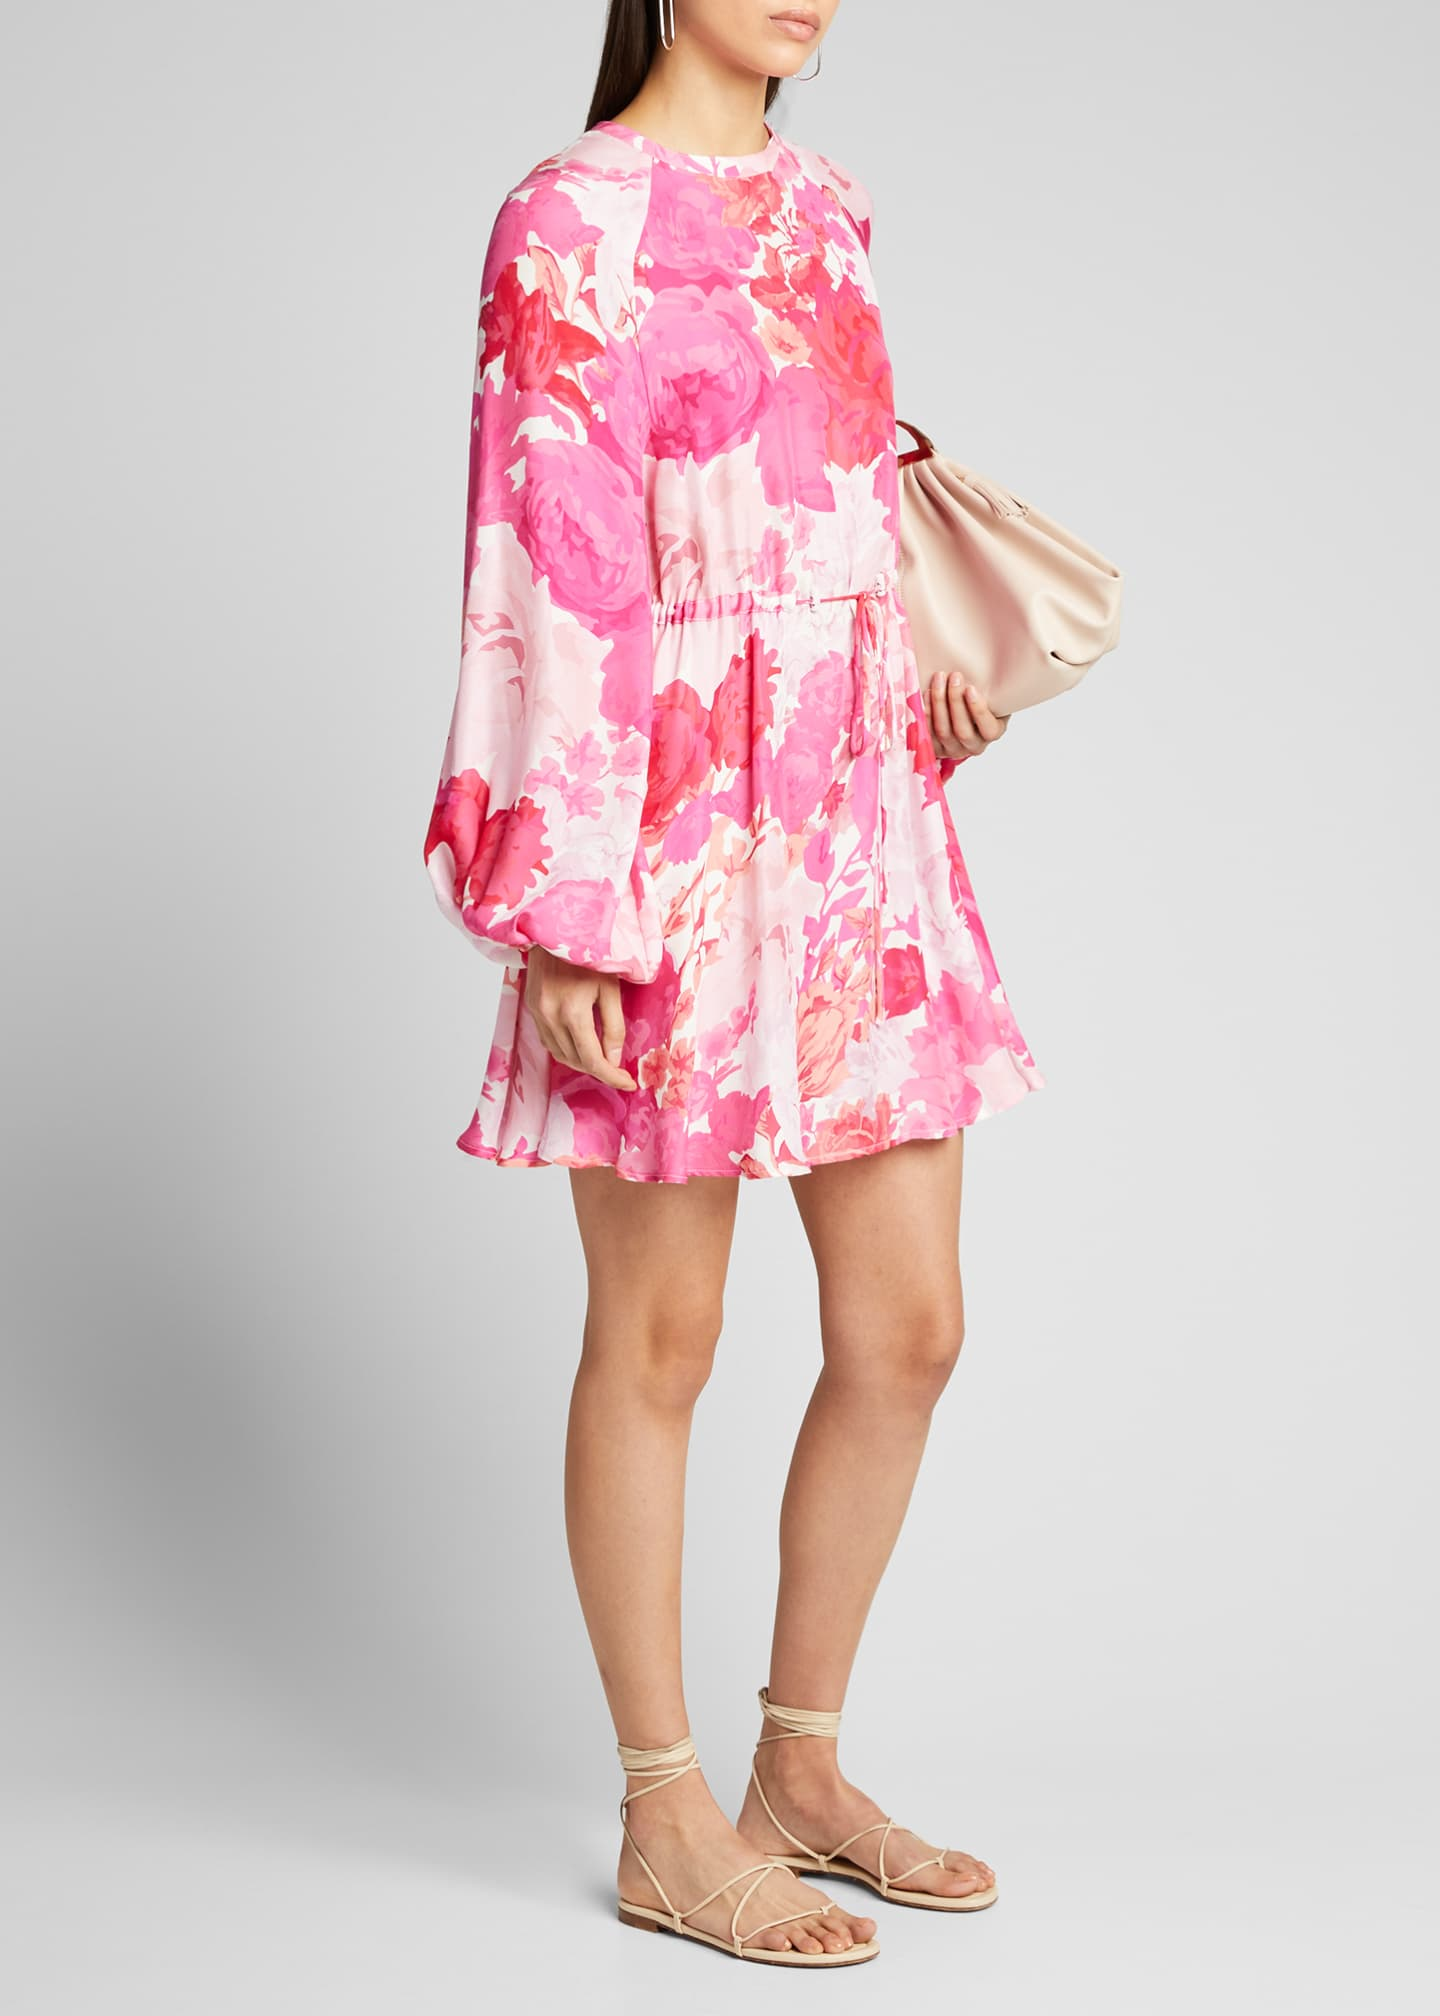 Stine Goya Coco Floral Tie-Waist Short Dress